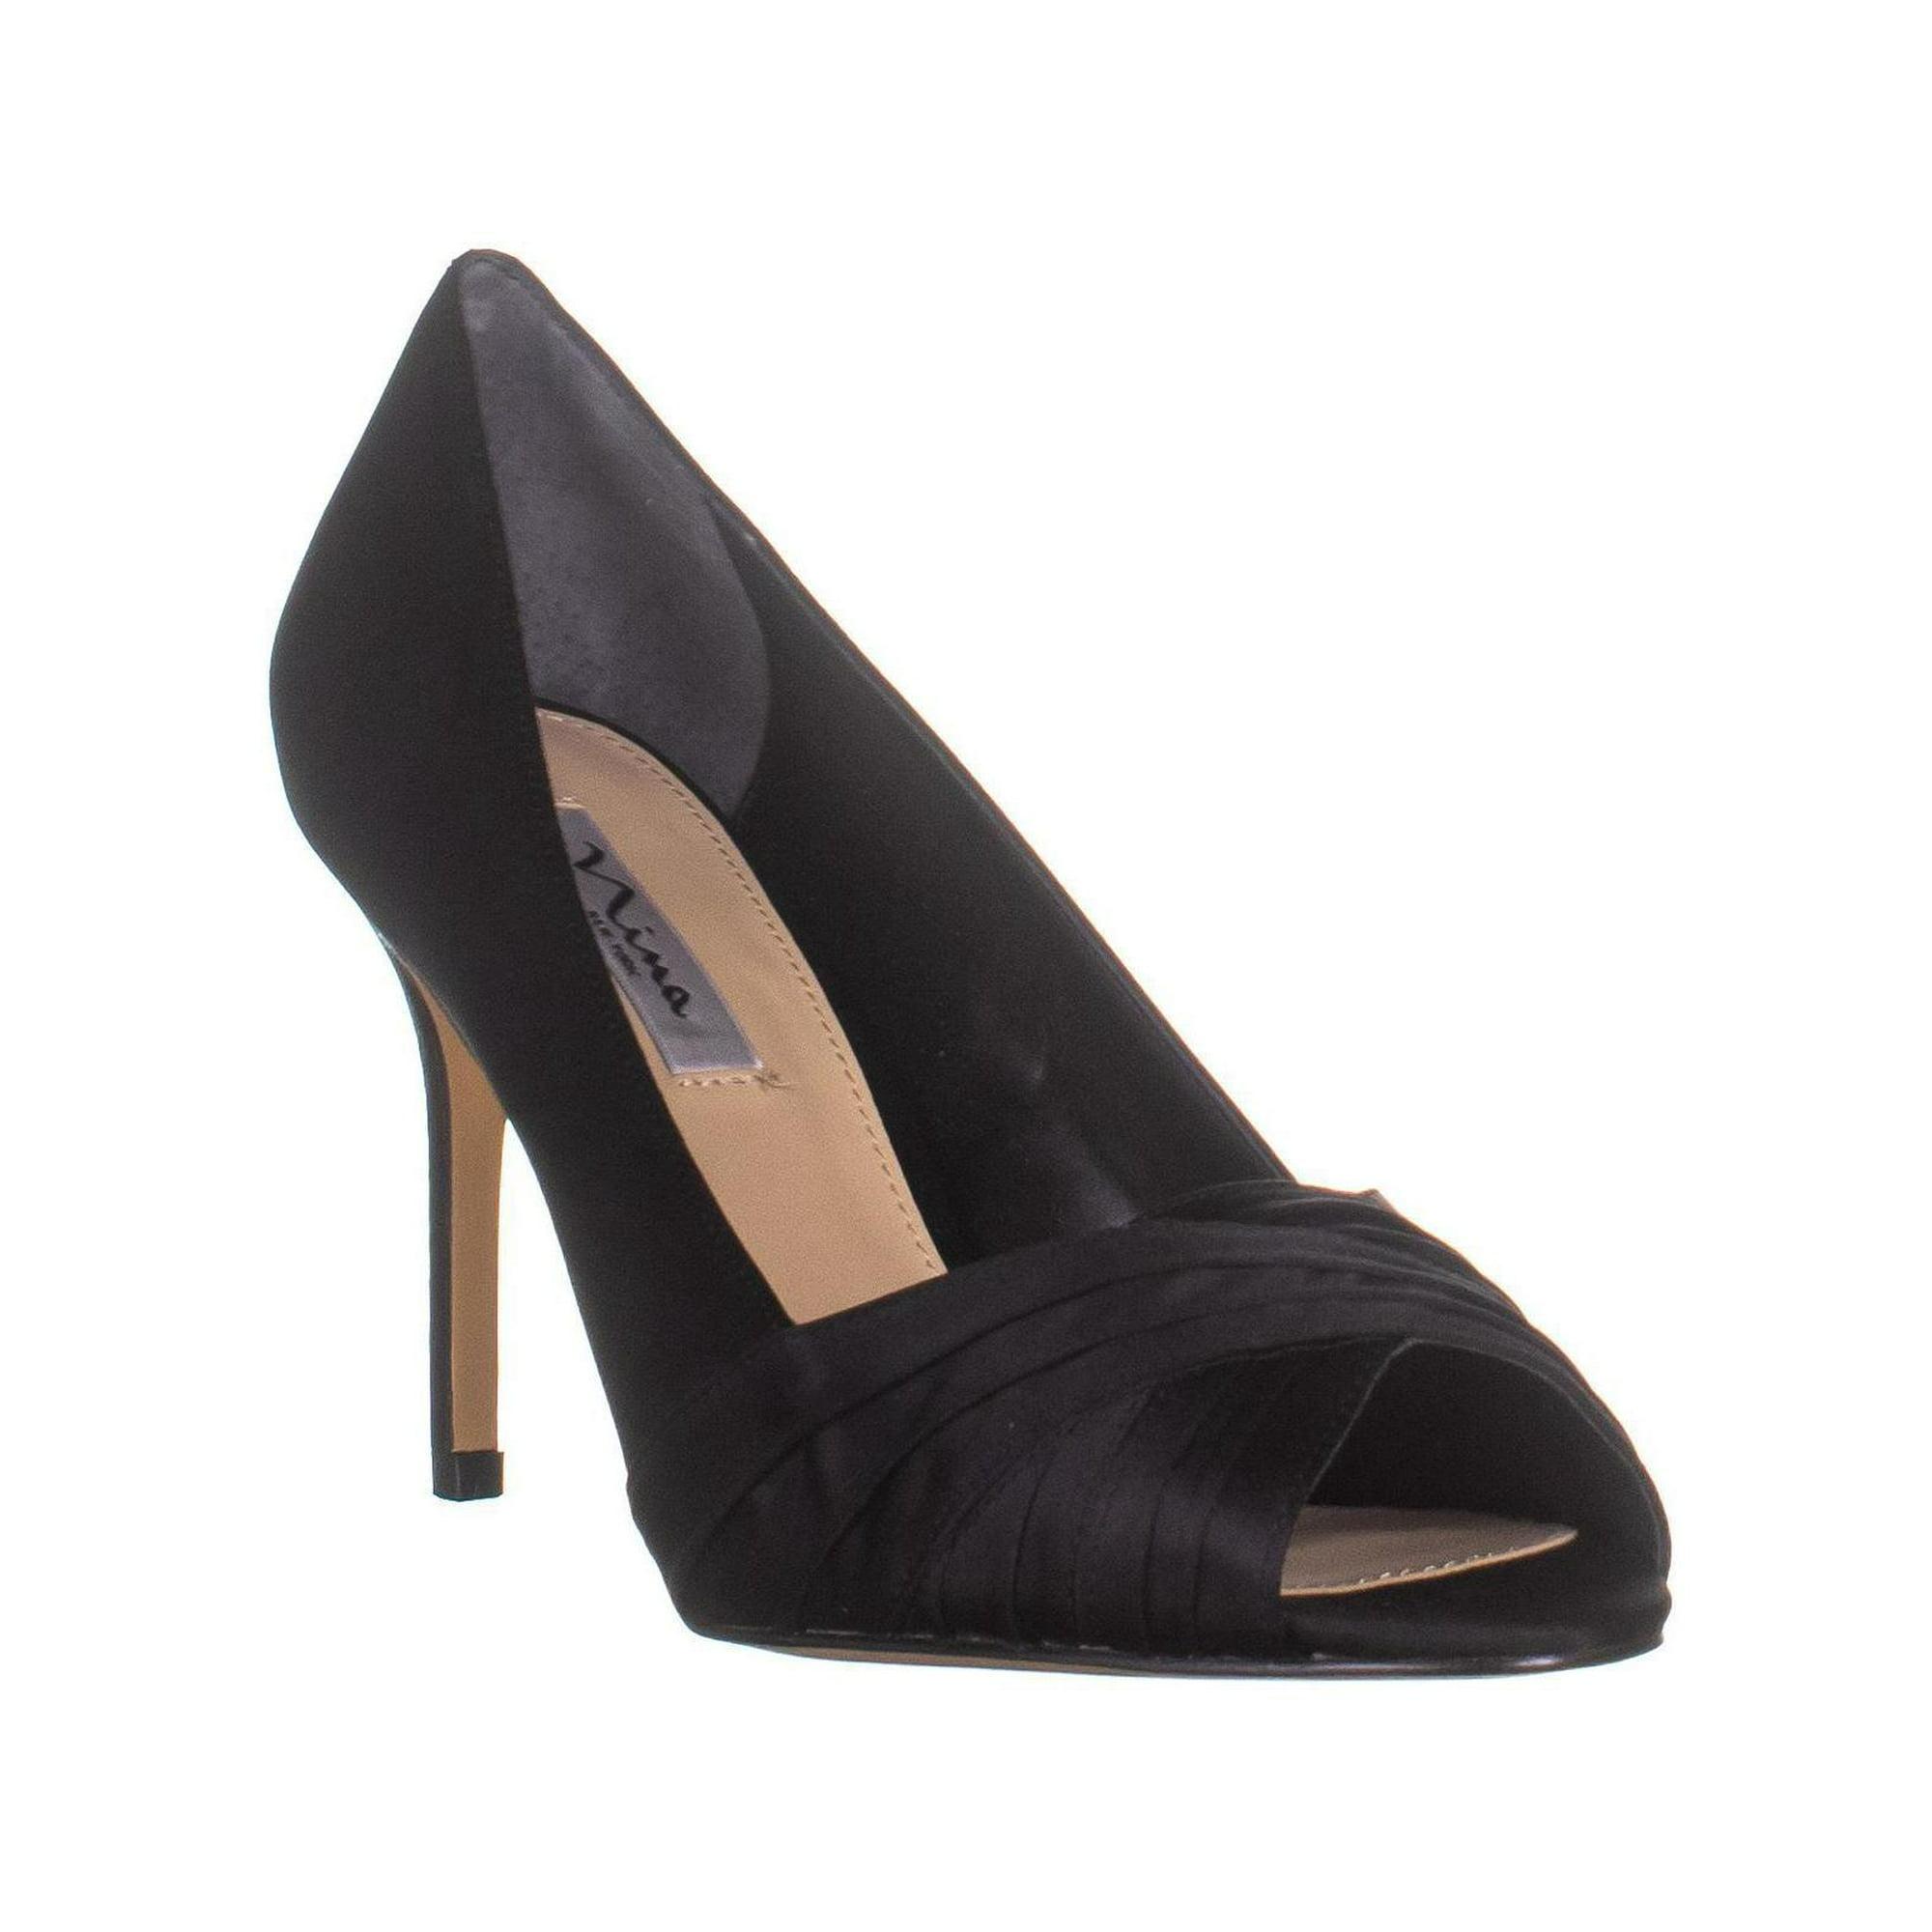 fad064b7c4b Nina Rhiyana Peep-Toe Pumps, Black Luster Satin